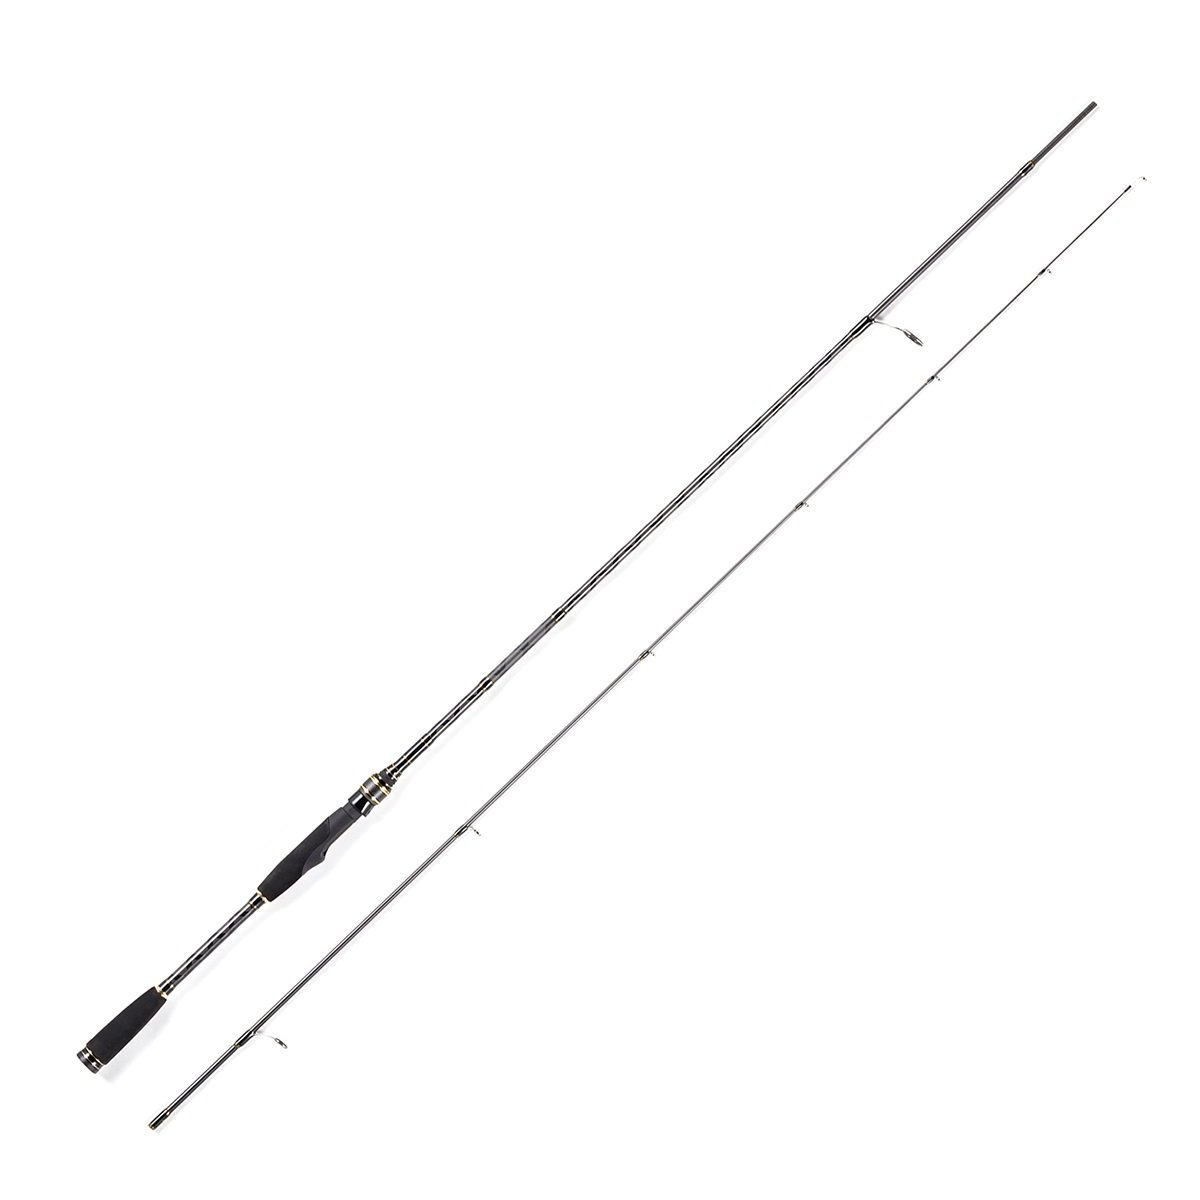 Sea Bass Rods